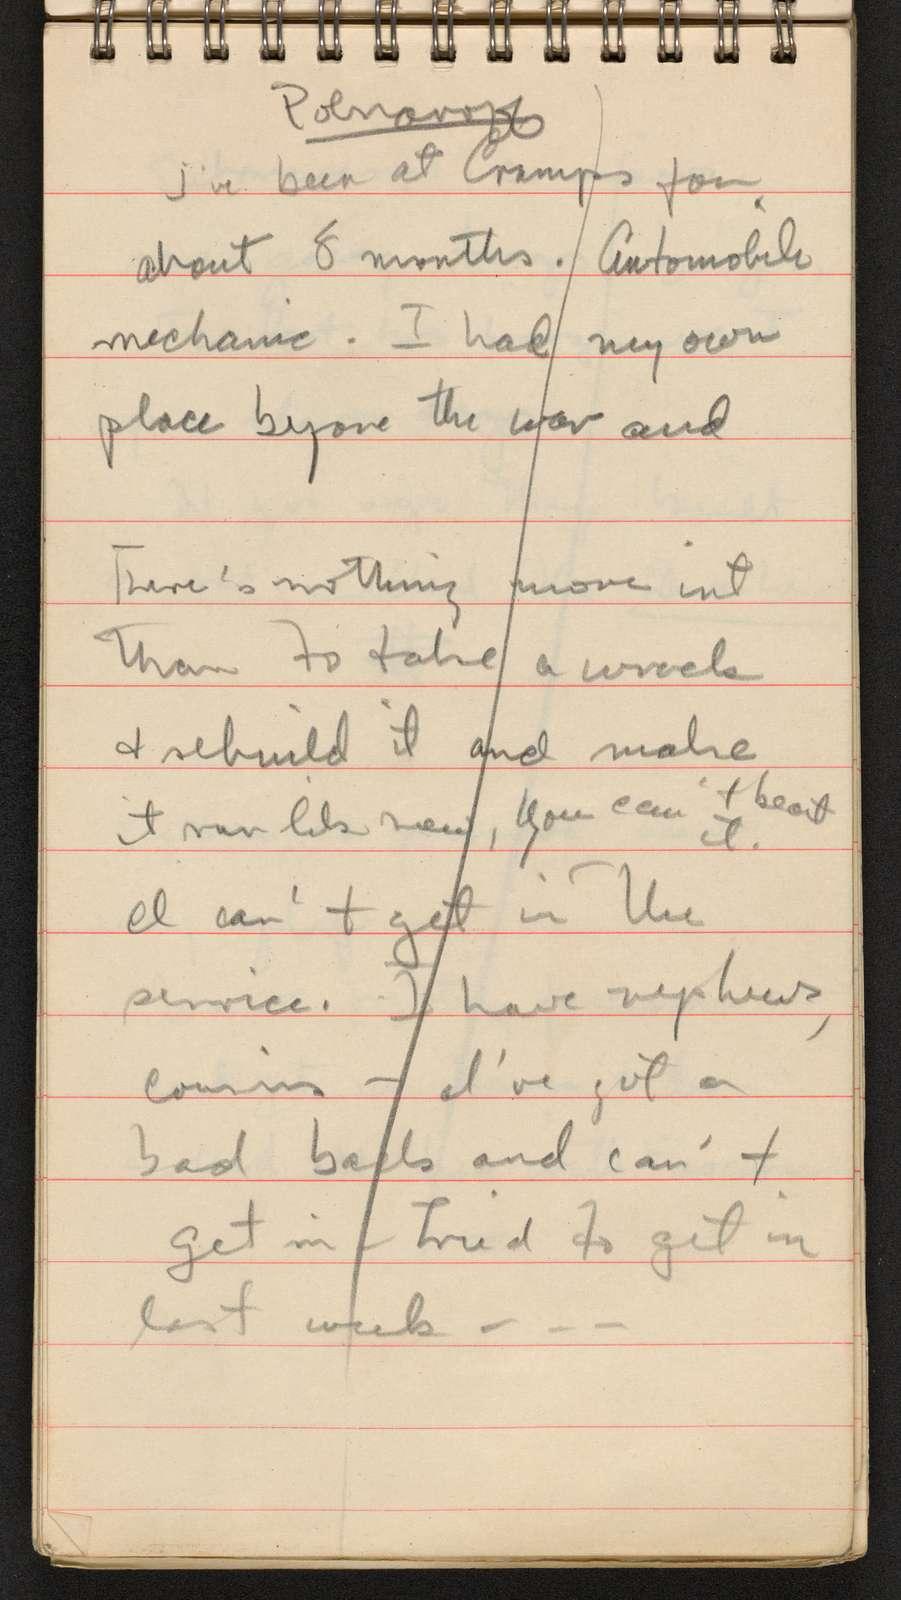 Alan Lomax Collection, Manuscripts, Philadelphia, PA, 1943